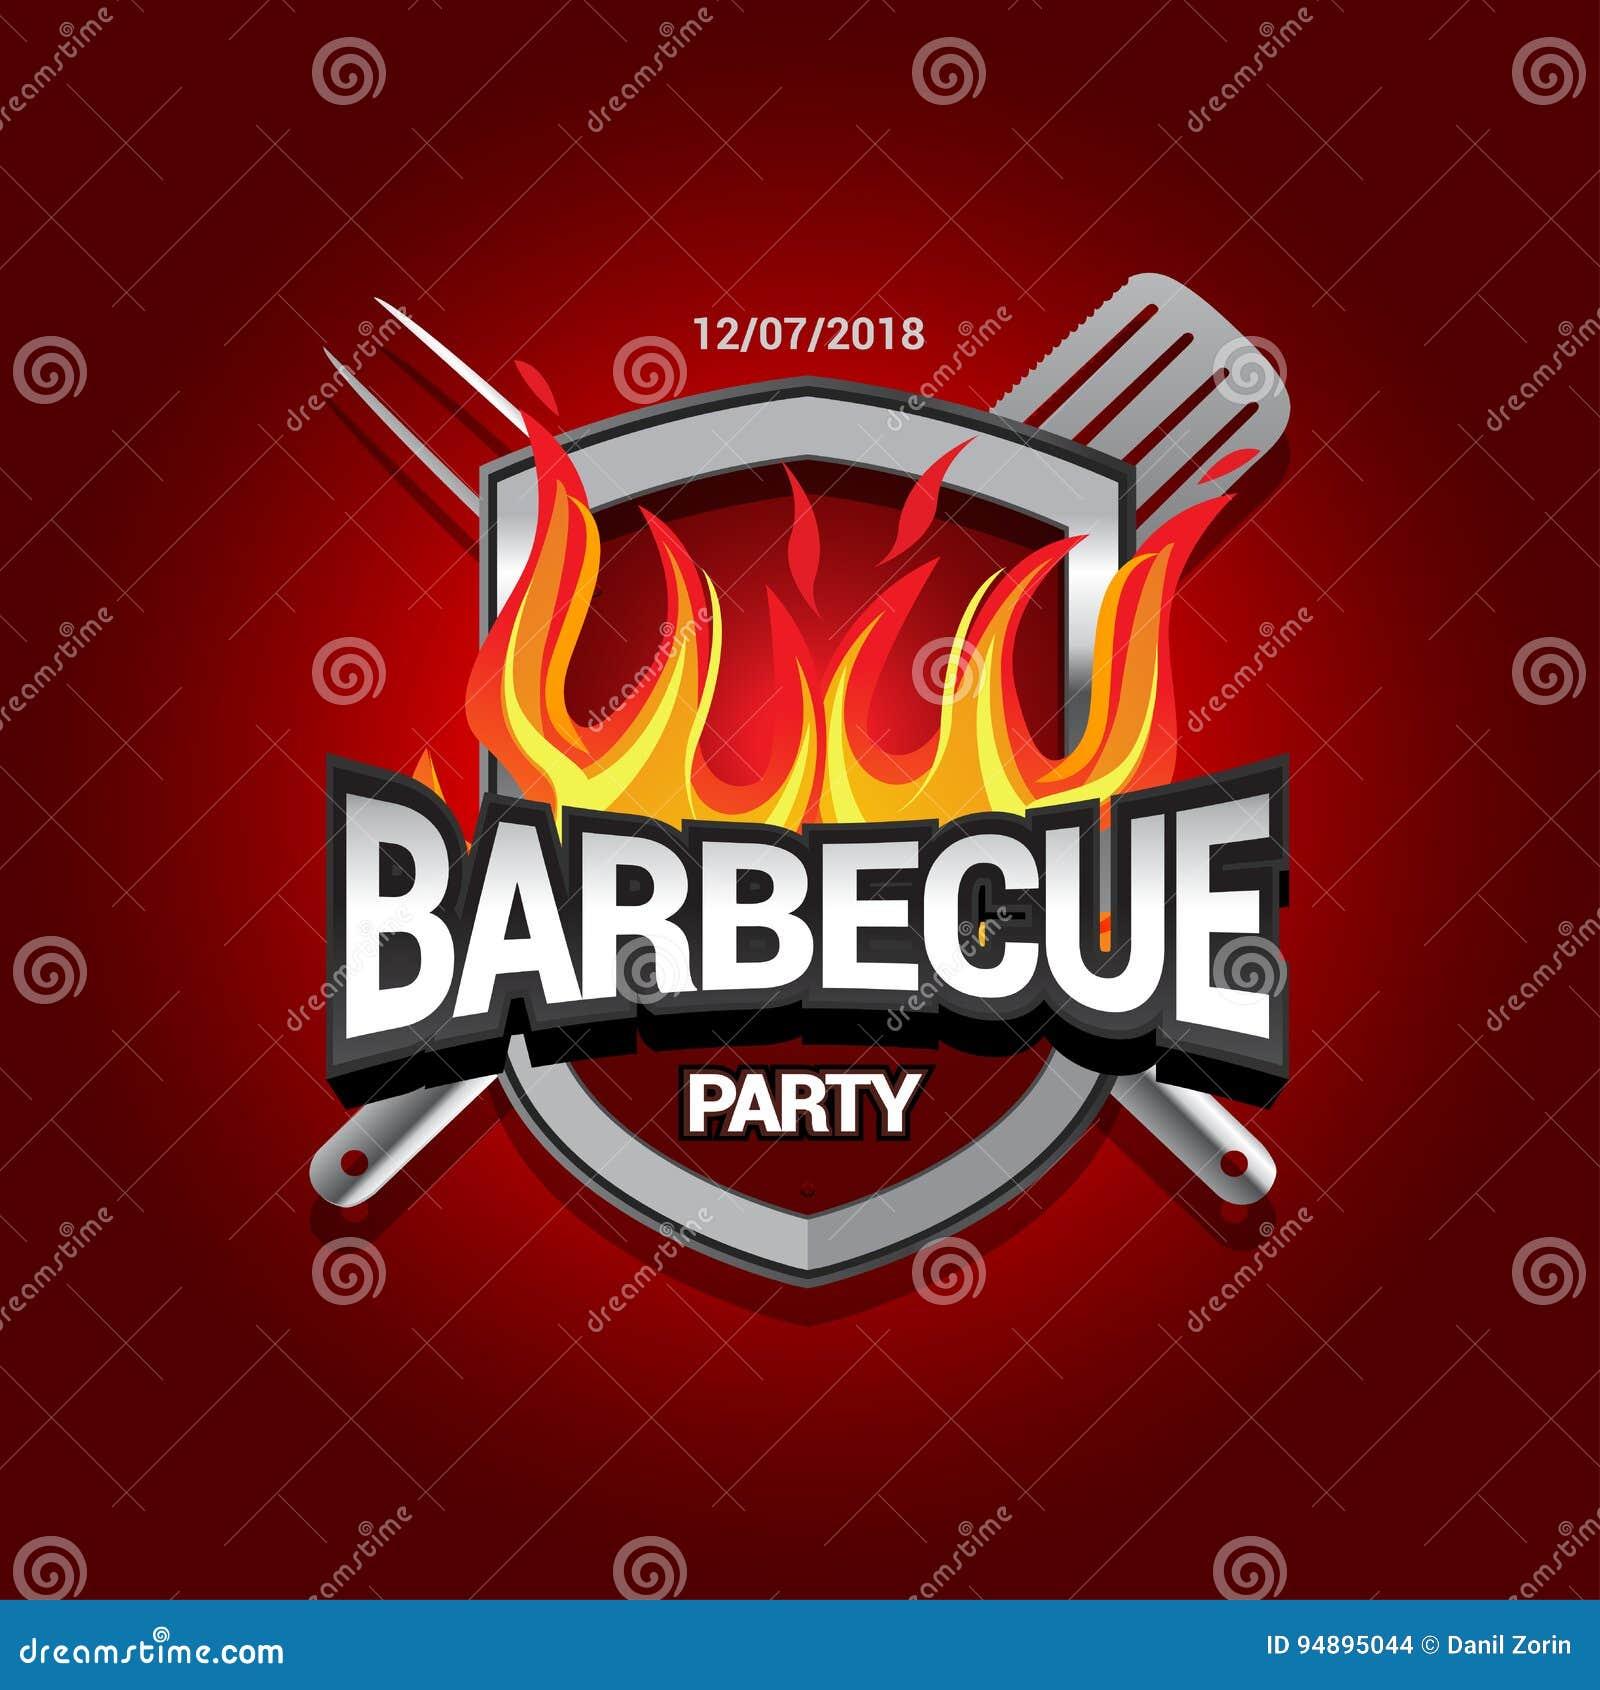 barbecue party design with fire on shield barbecue invitation